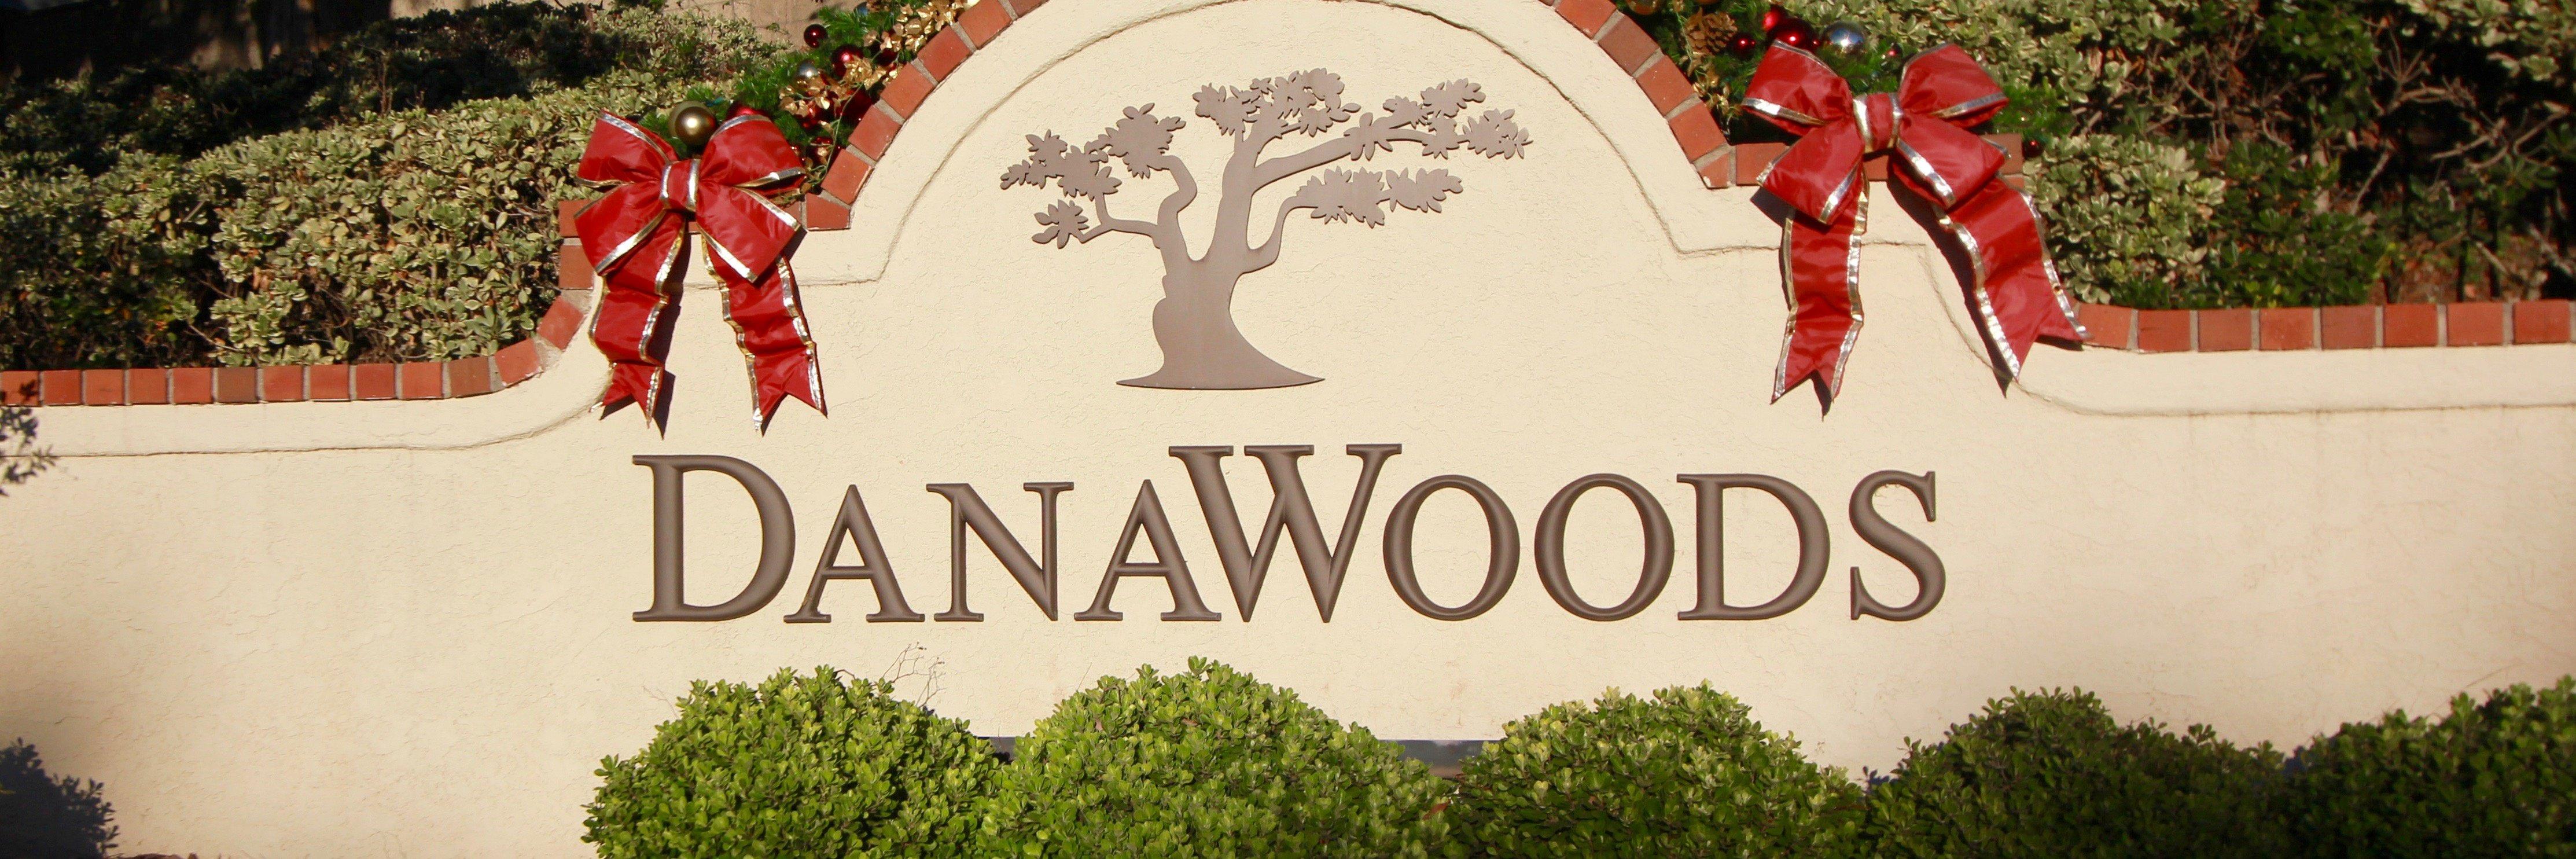 Dana Woods Community Marquee in Dana Point Ca